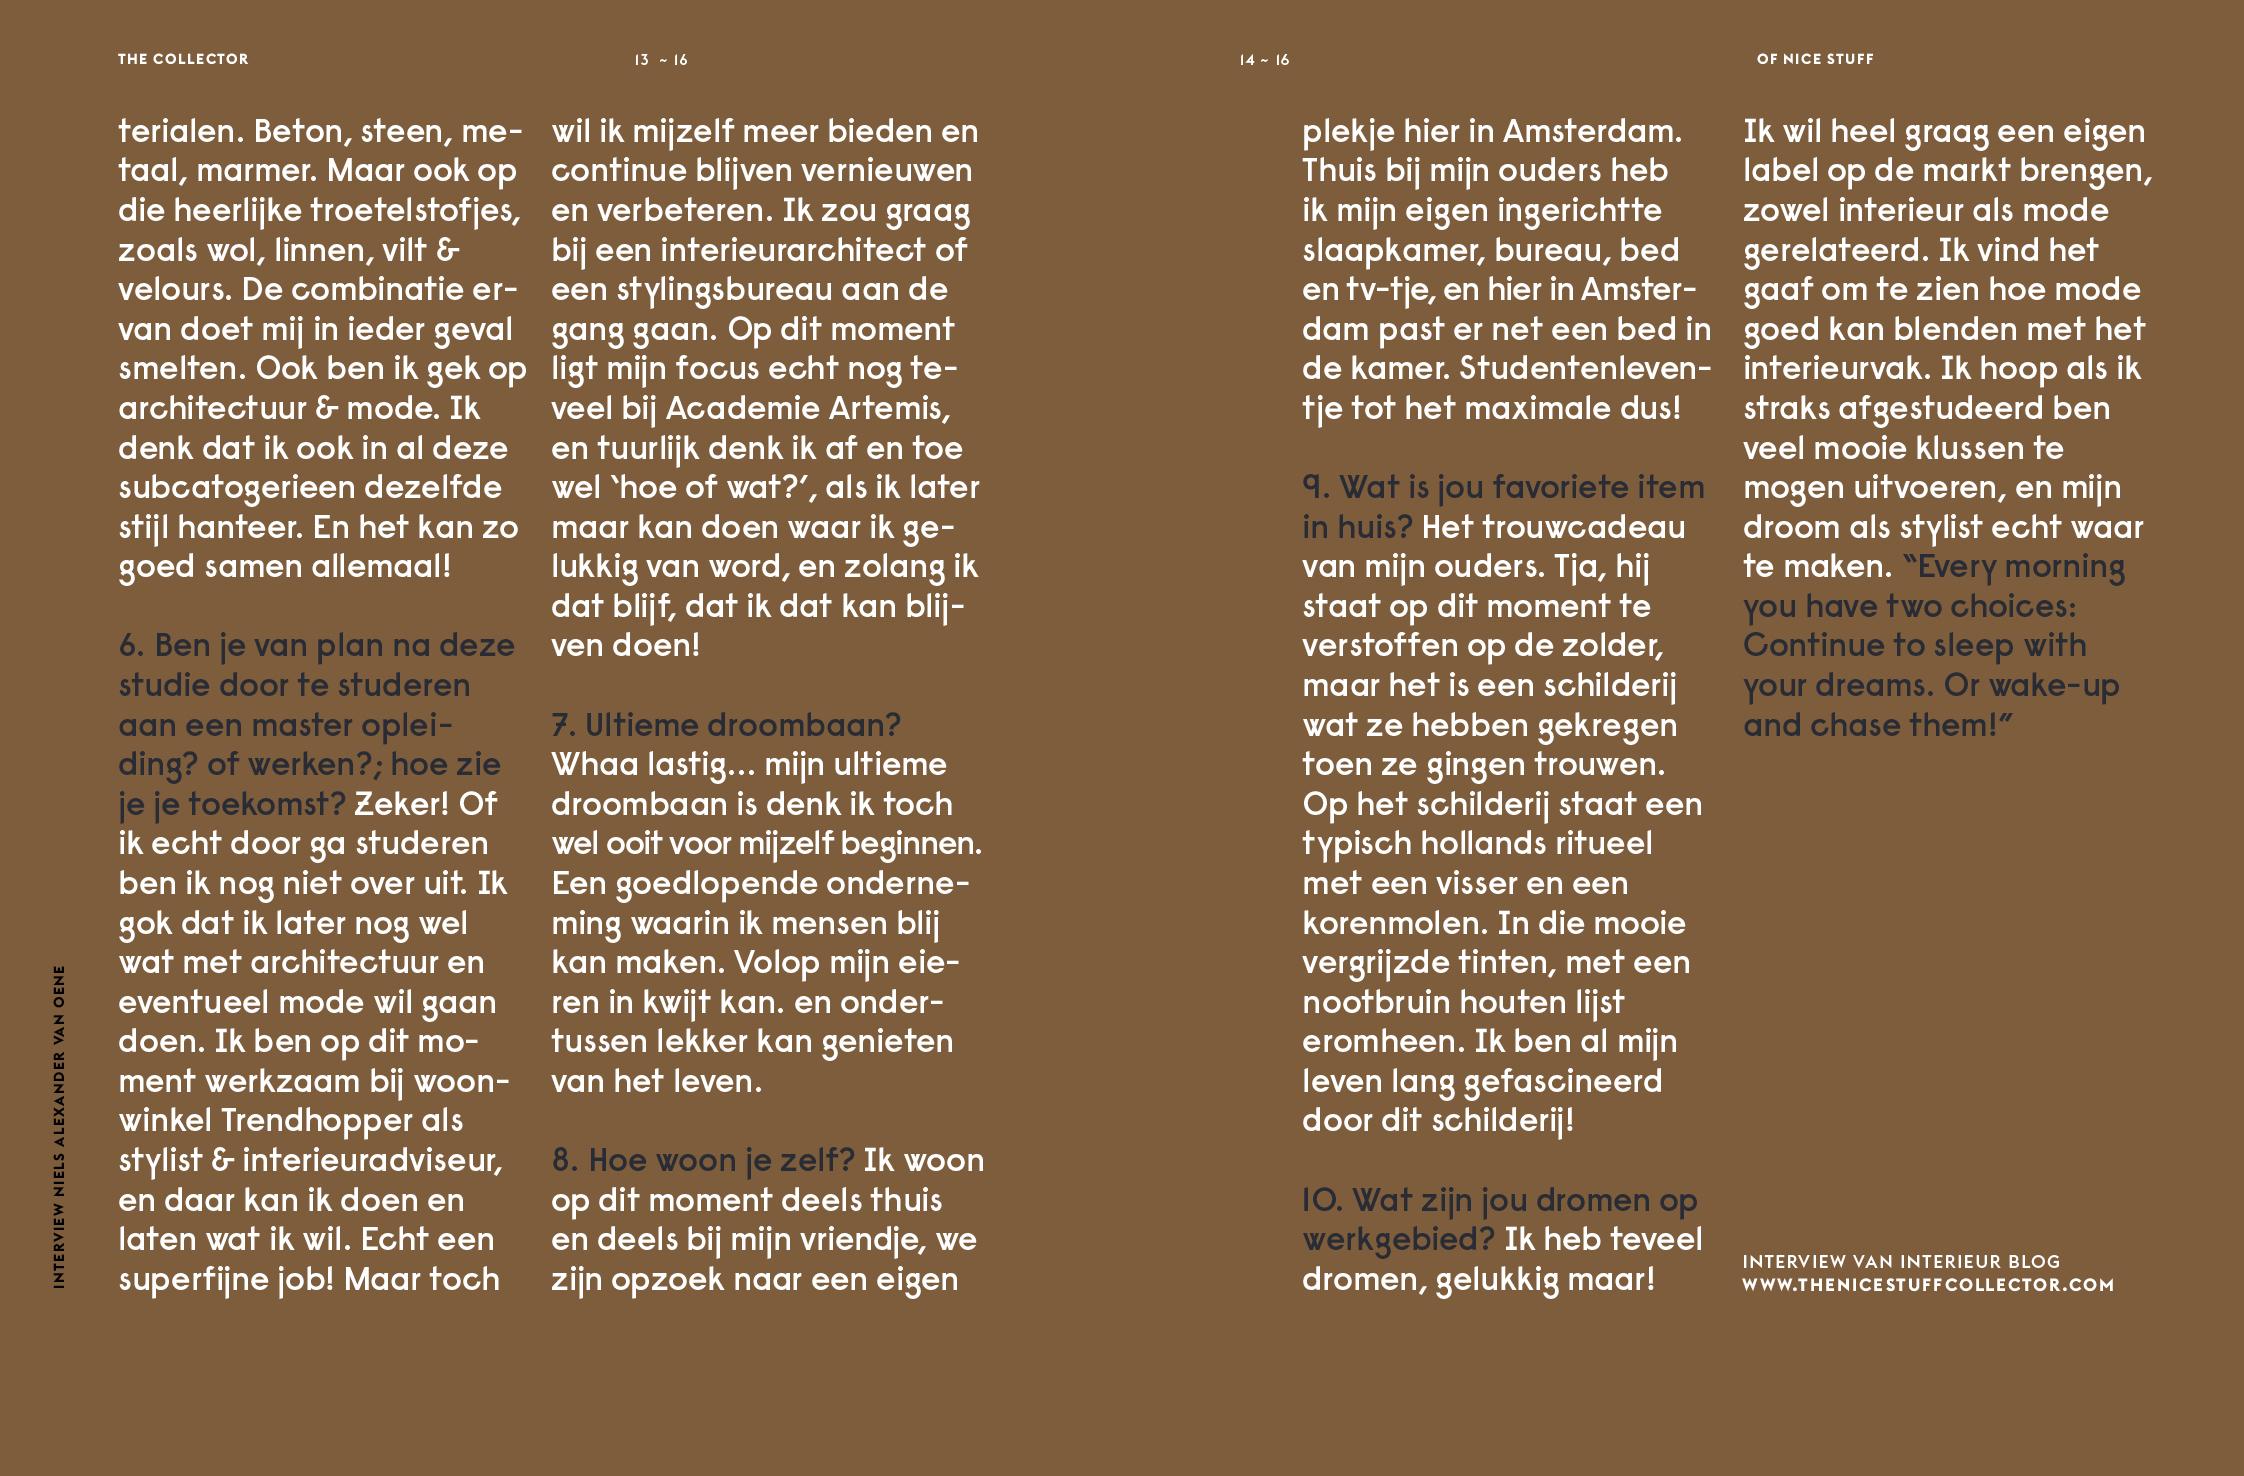 THE-NICE-STUFF-COLLECTOR_INTERIEUR-BLOG_THEO-BERT-POT_INTERVIEW_NIELS-ALEXANDER_DEF7.jpg